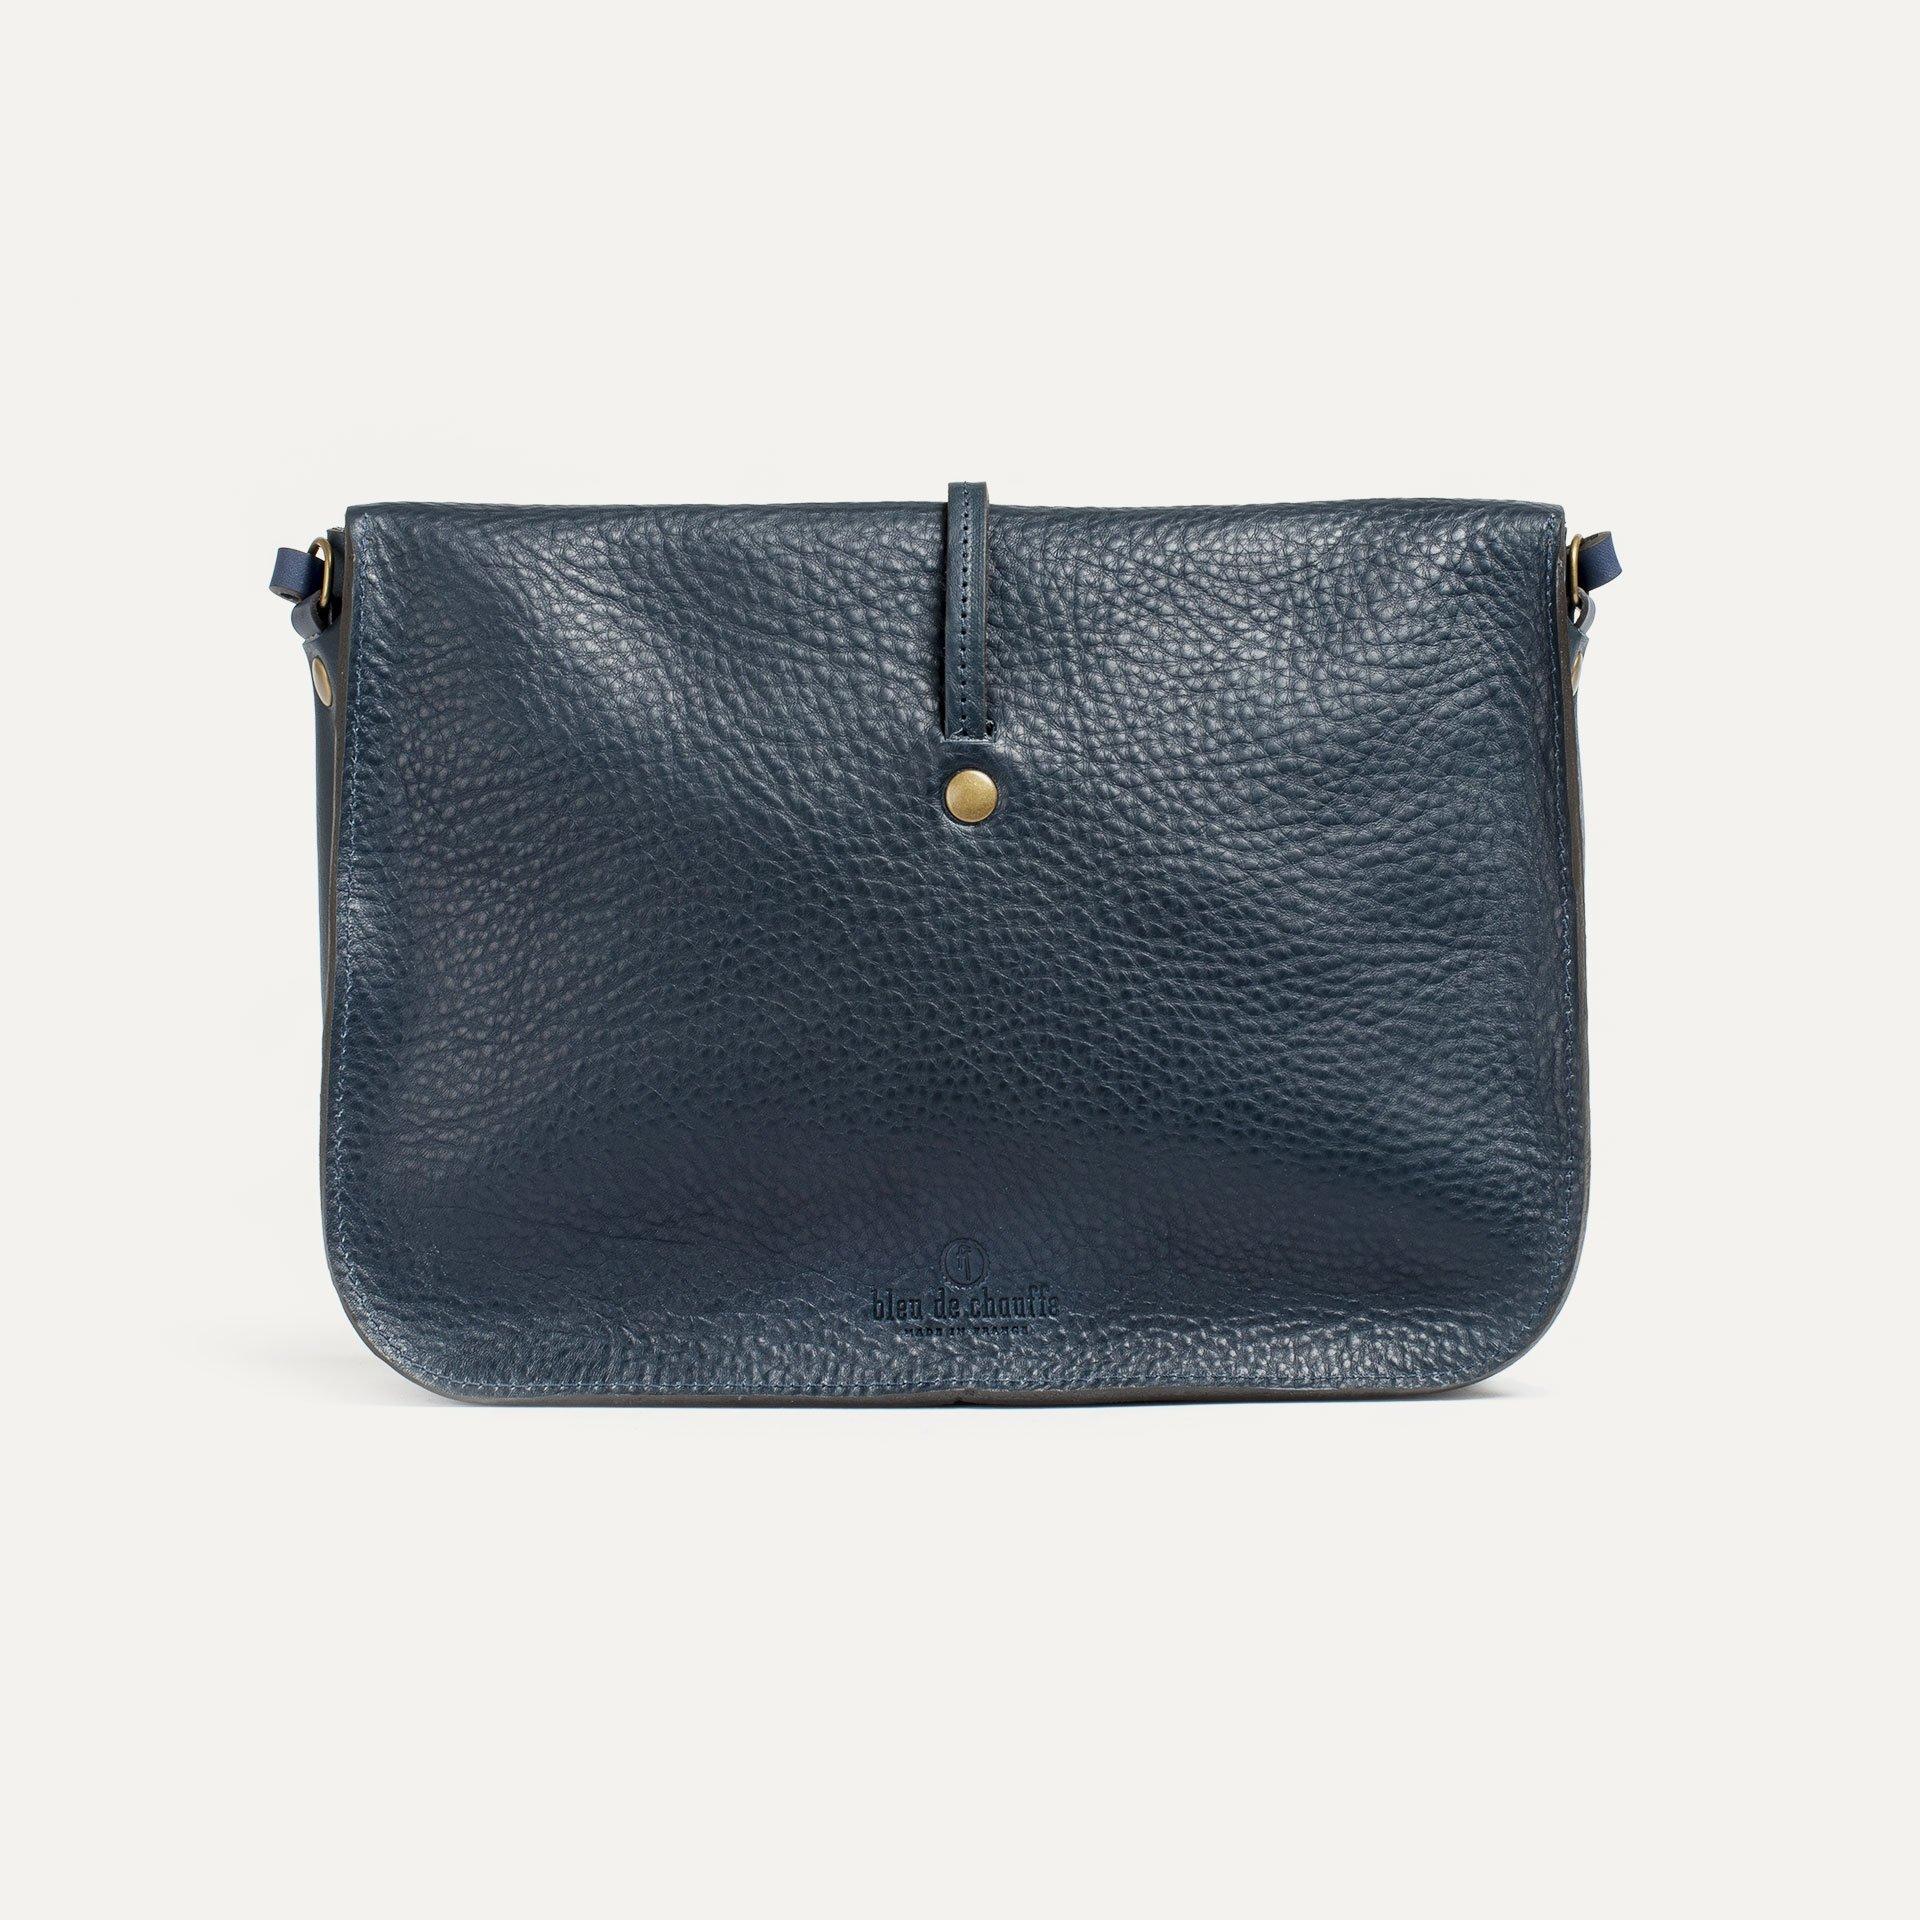 Pastel handbag - Navy Blue (image n°3)